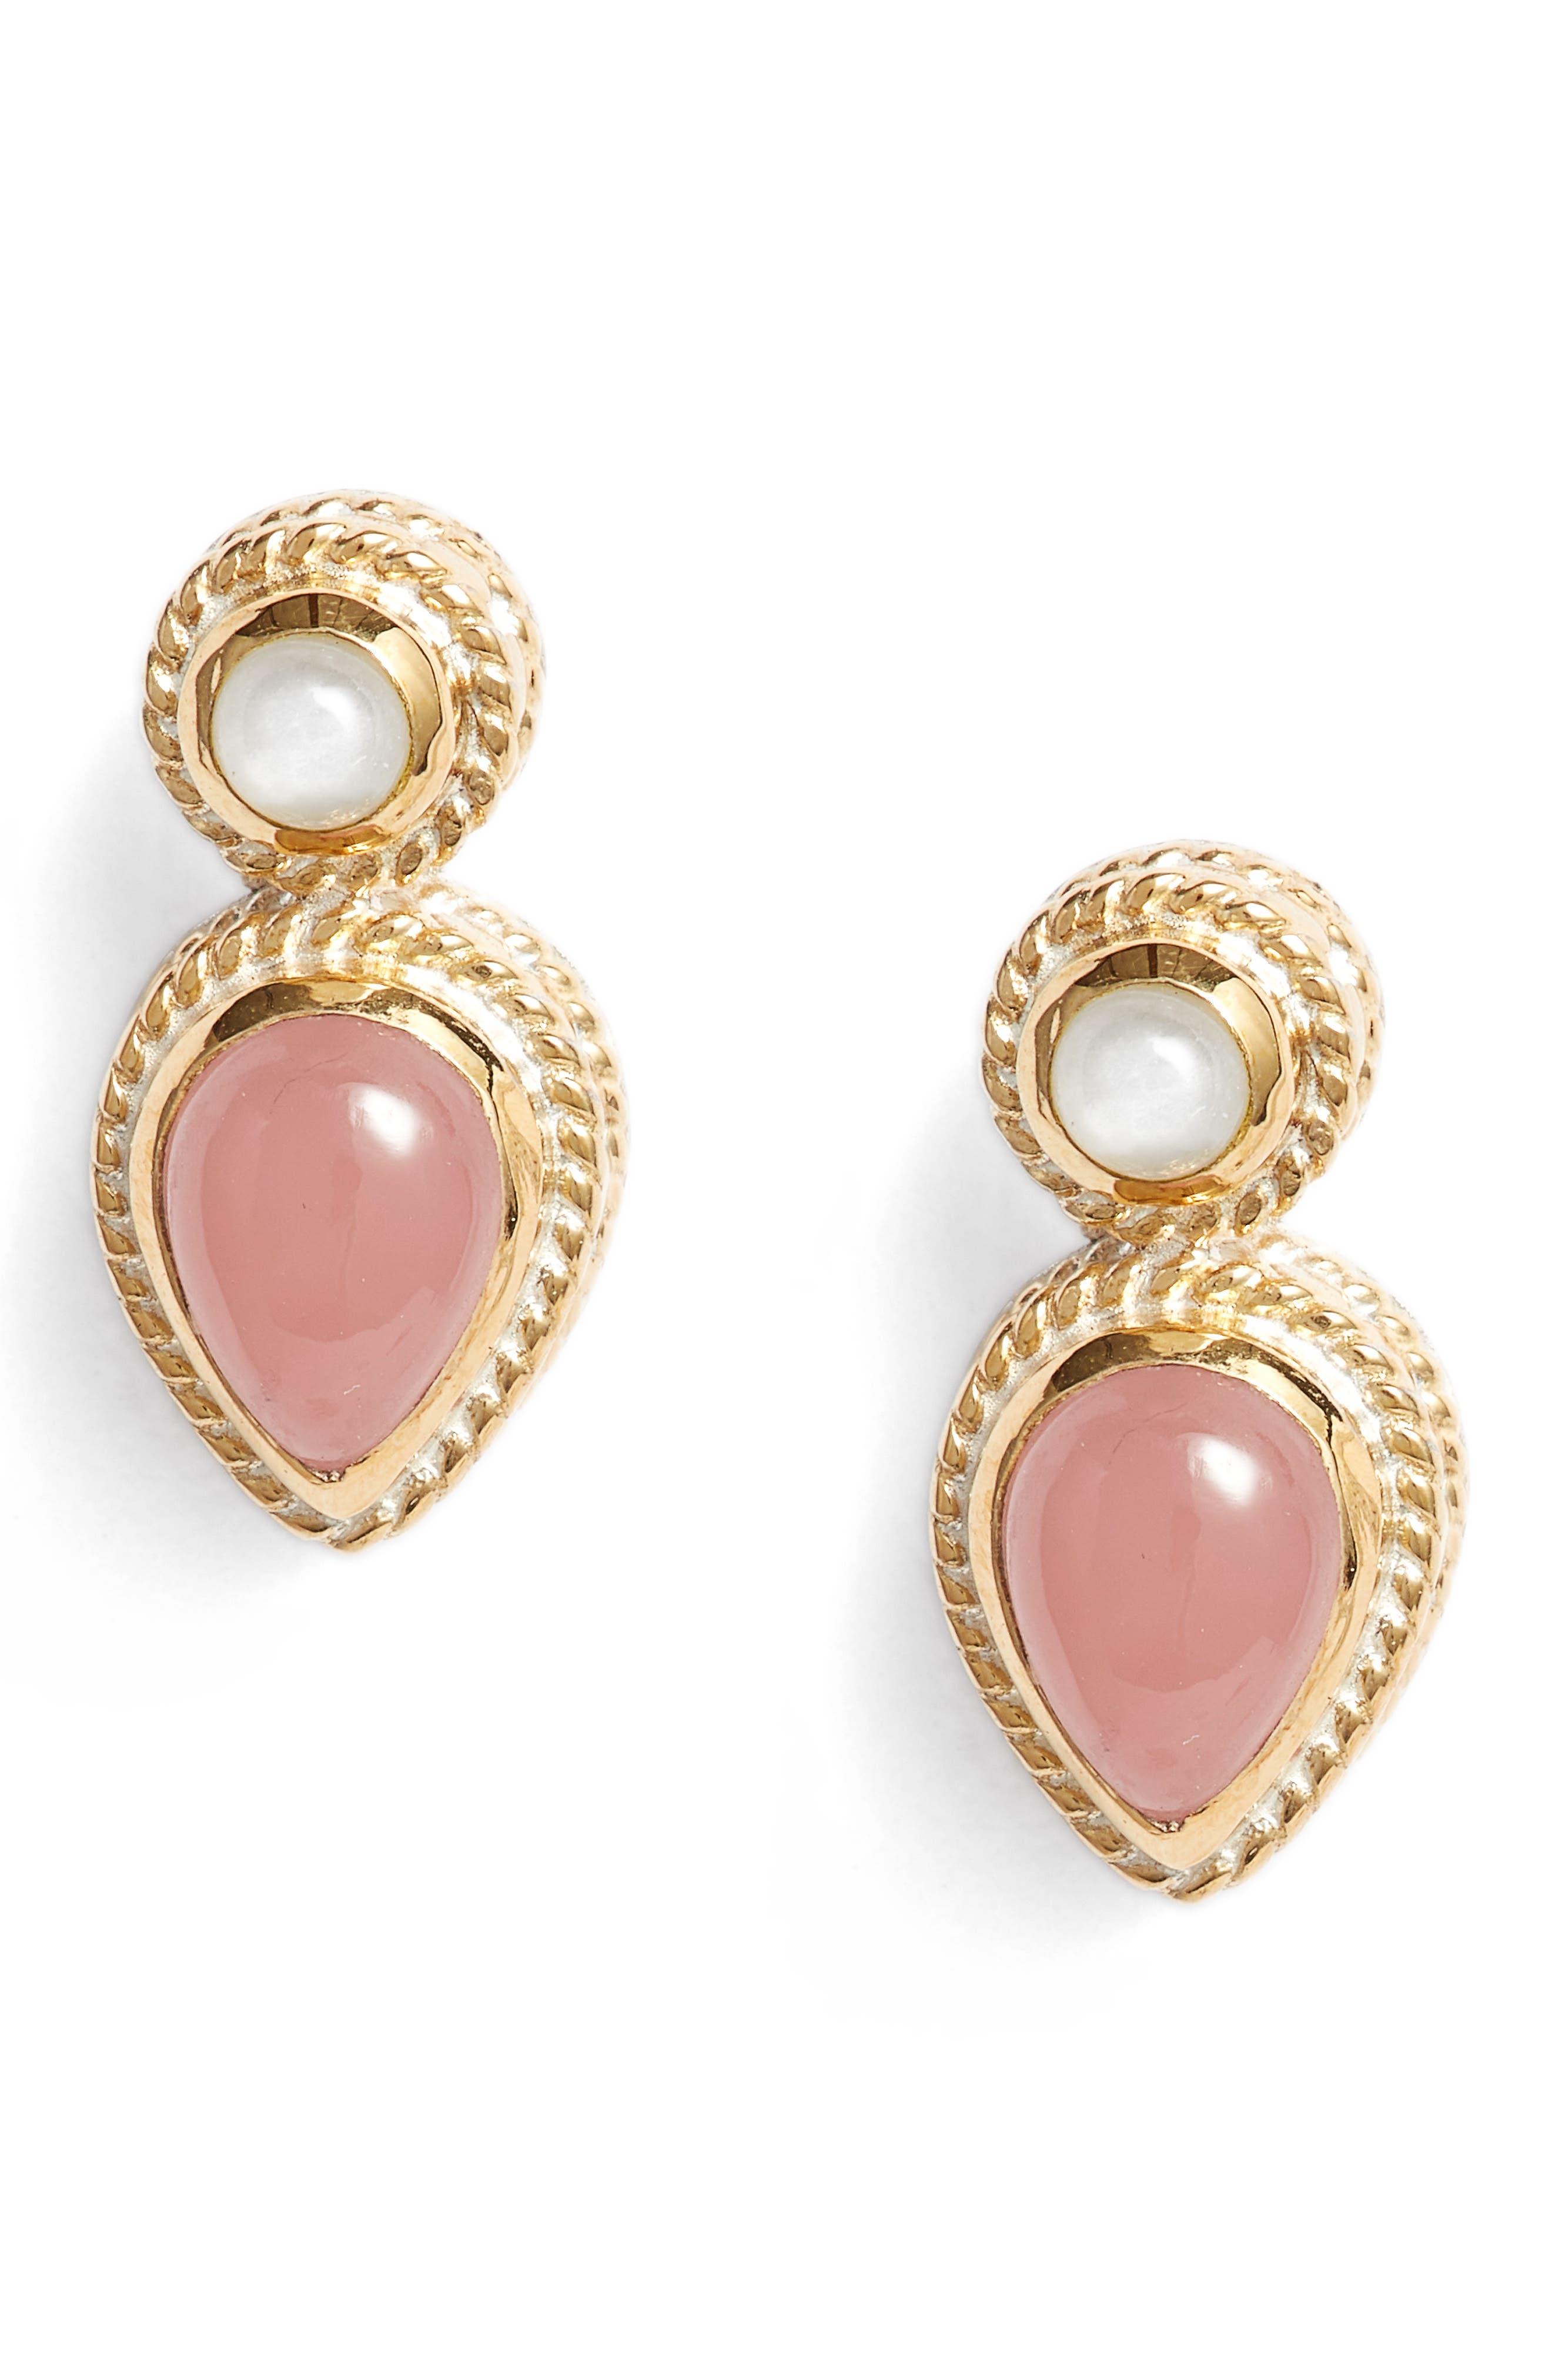 Guava Quartz & Moonstone Stud Earrings,                             Main thumbnail 1, color,                             Gold/ Guava/ Moonstone